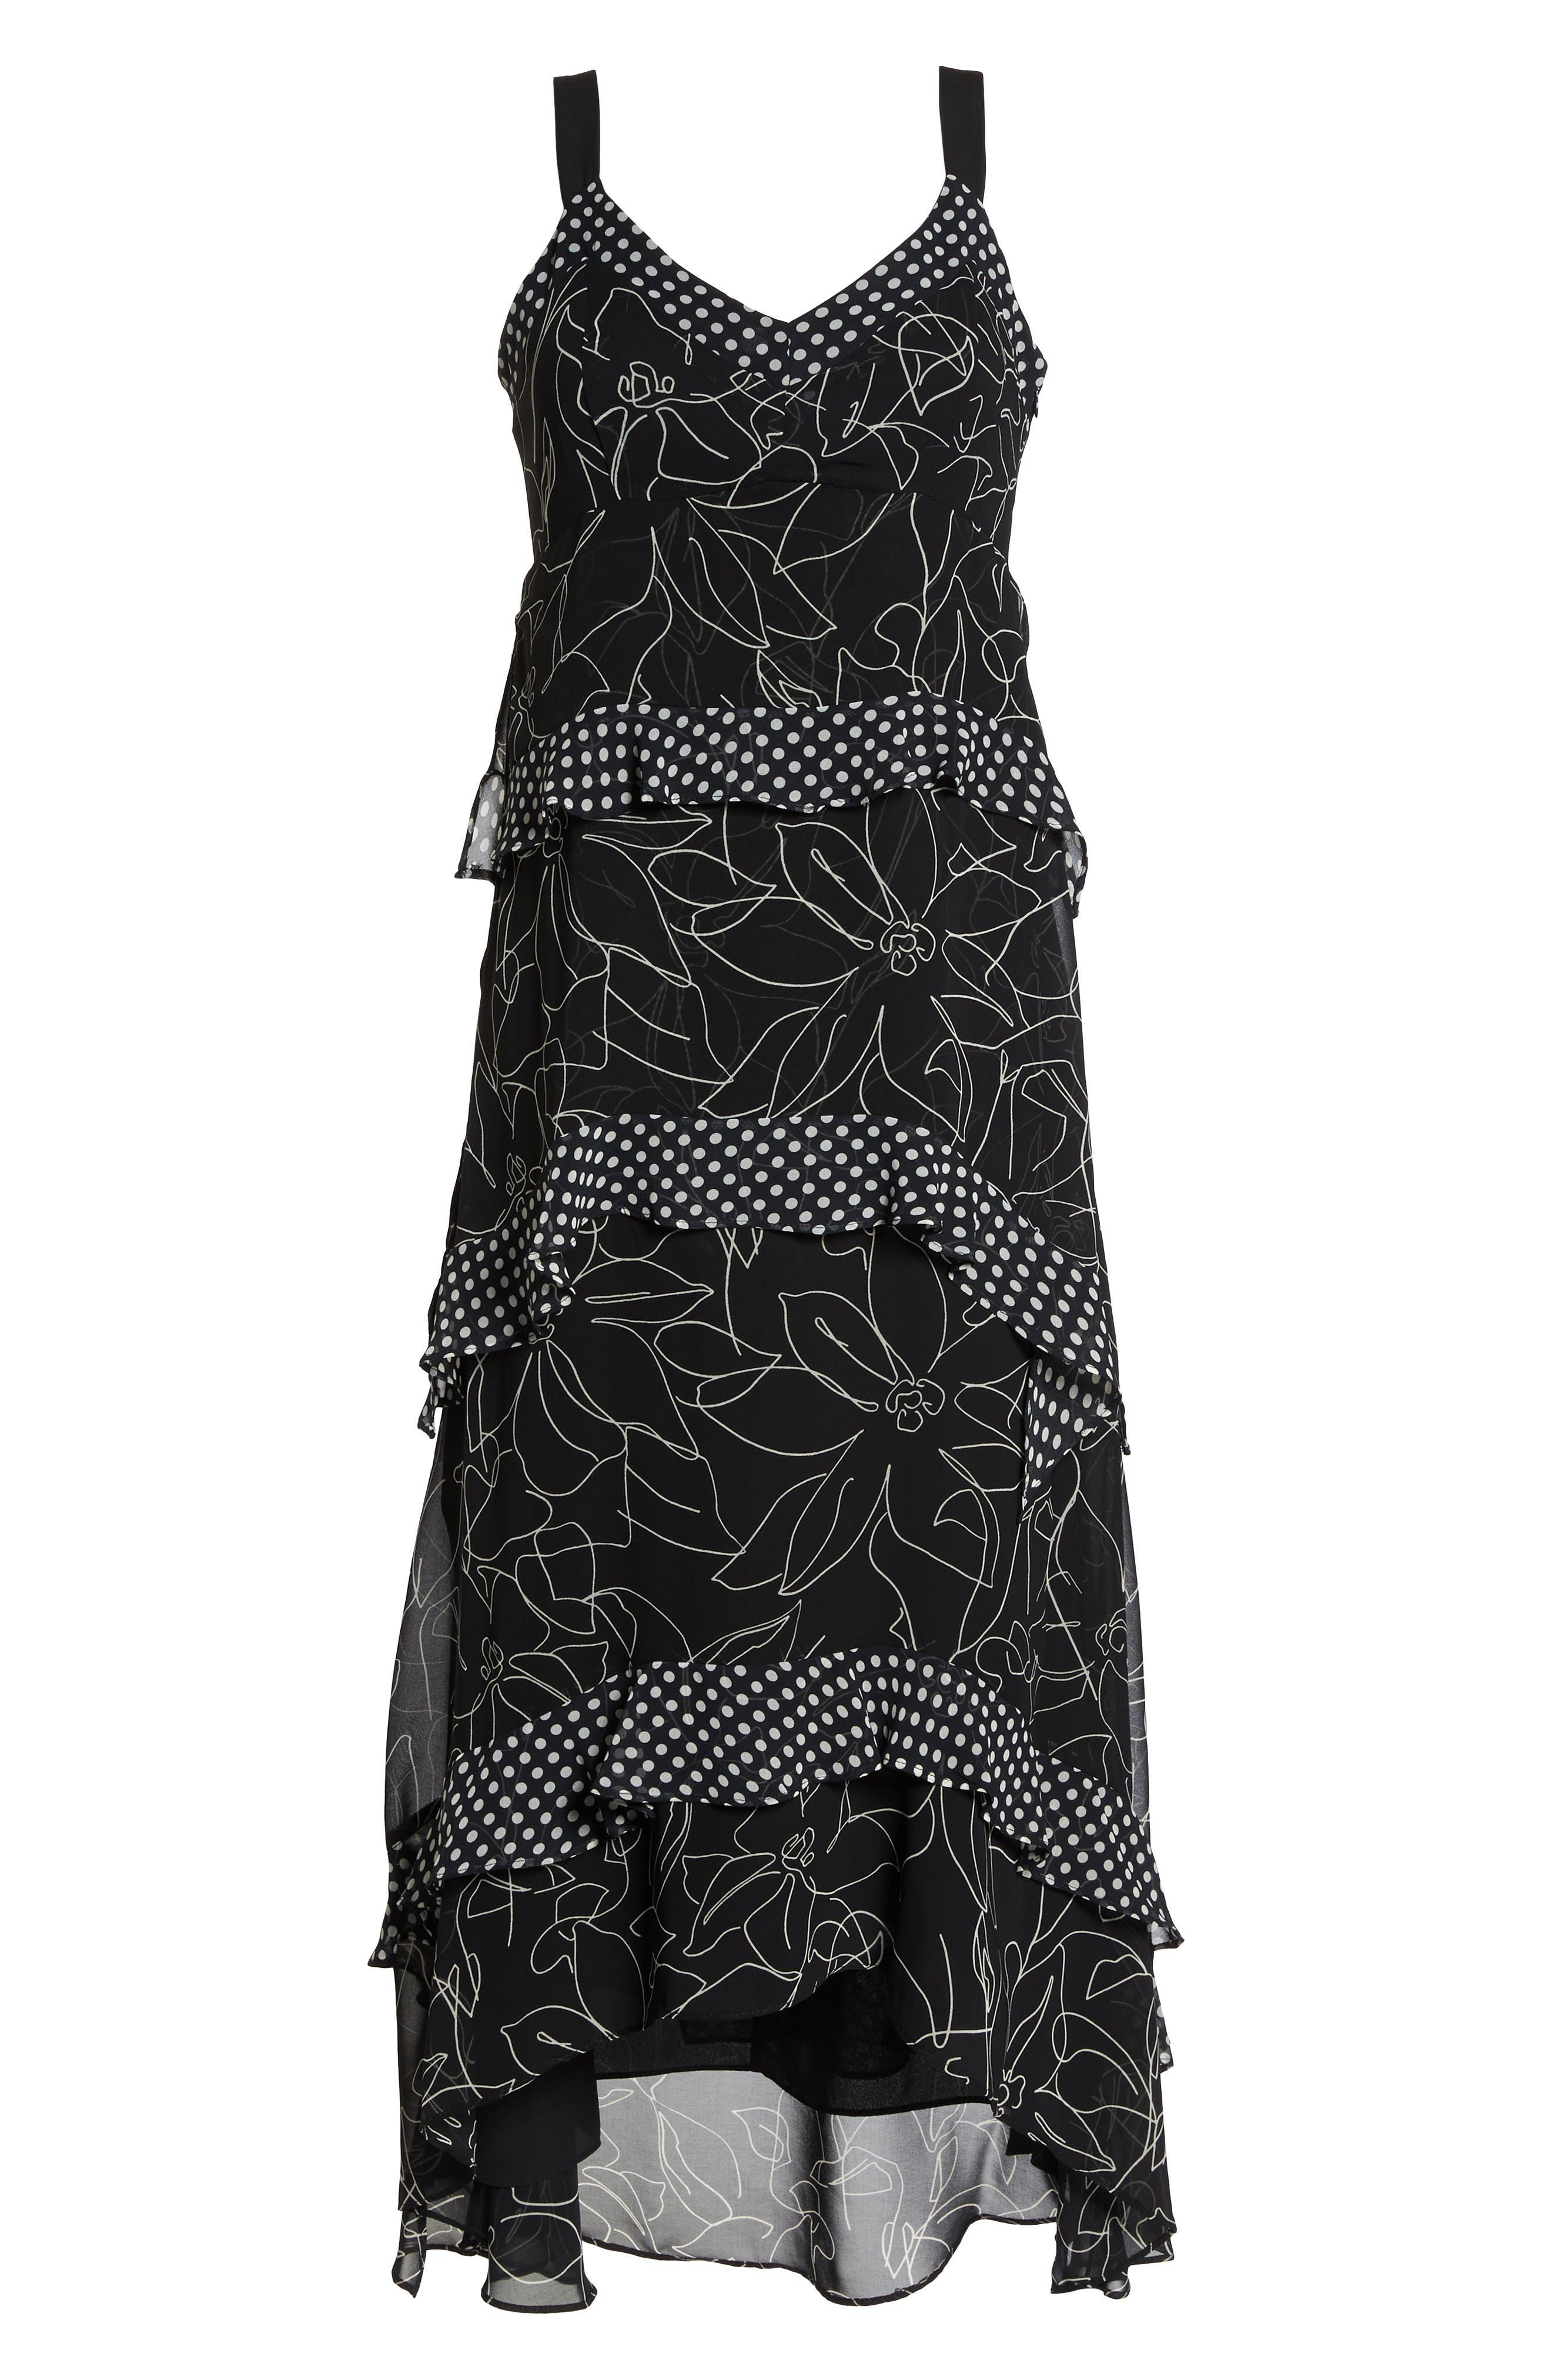 Polka Dot & Floral Tiered Maxi Dress,                             Alternate thumbnail 7, color,                             Black Ivory